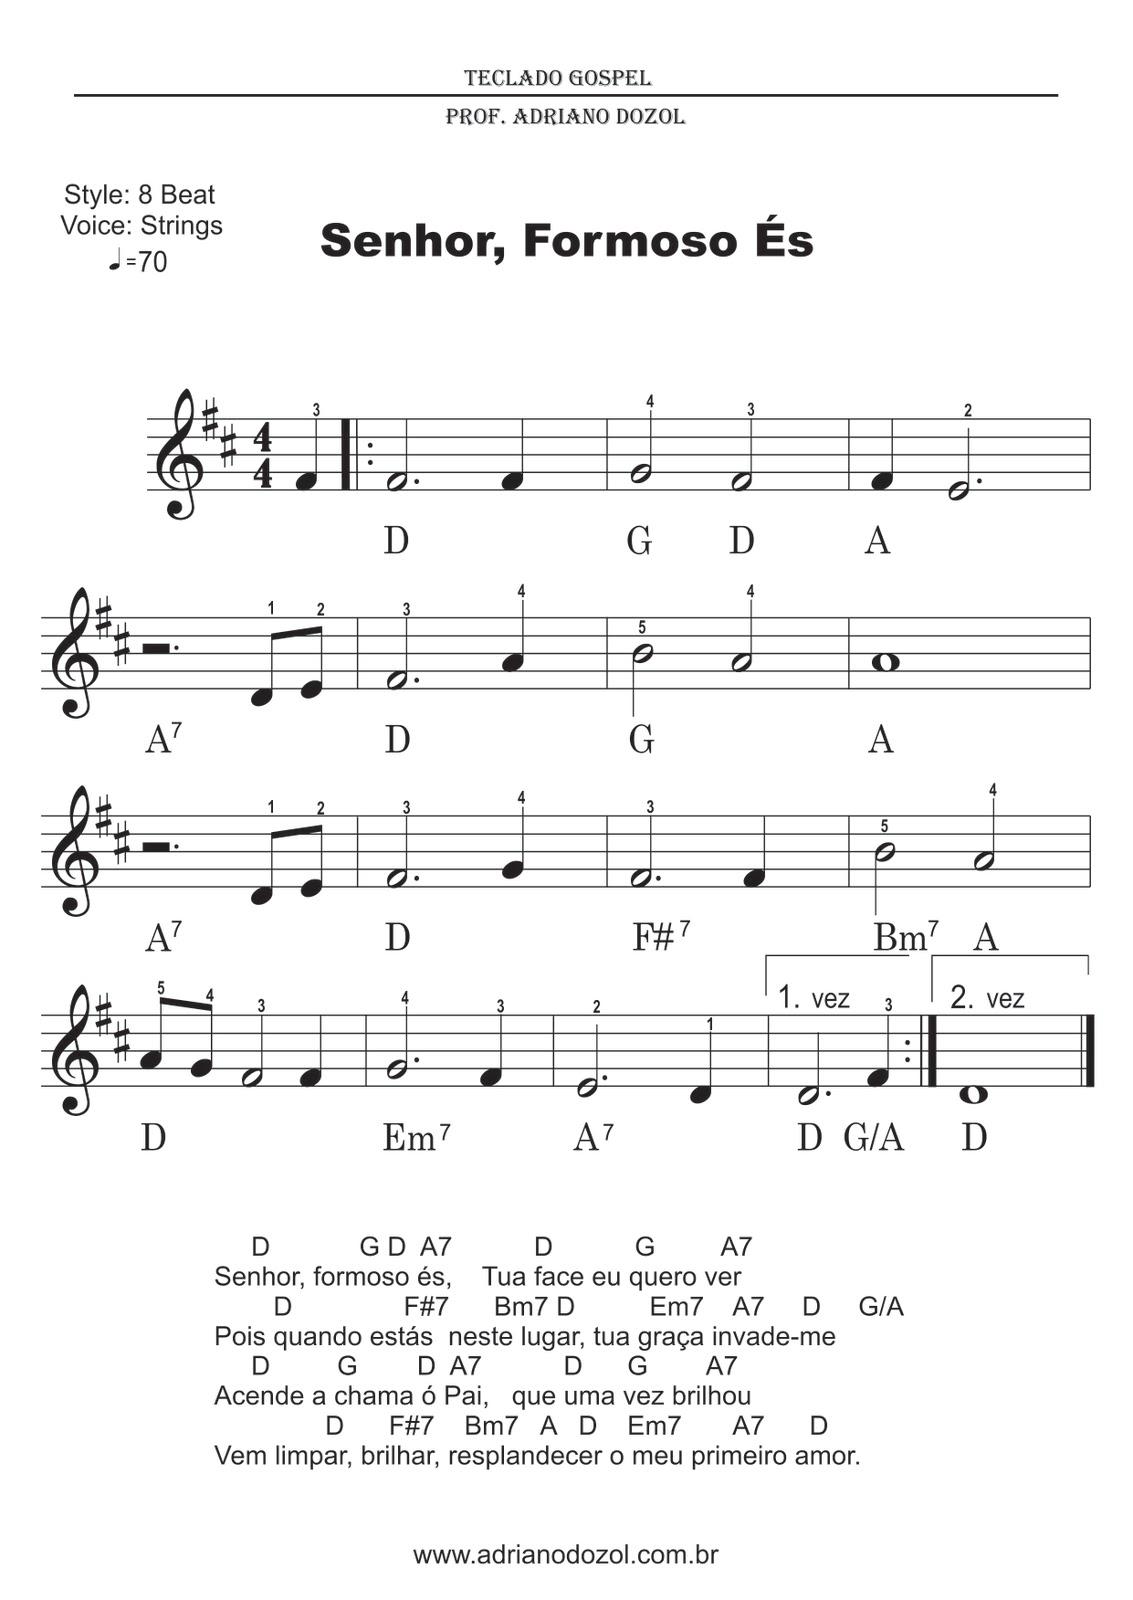 Populares Adriano Dozol - Dicas, Partituras Grátis e Vídeos - Teclado | Piano YL54